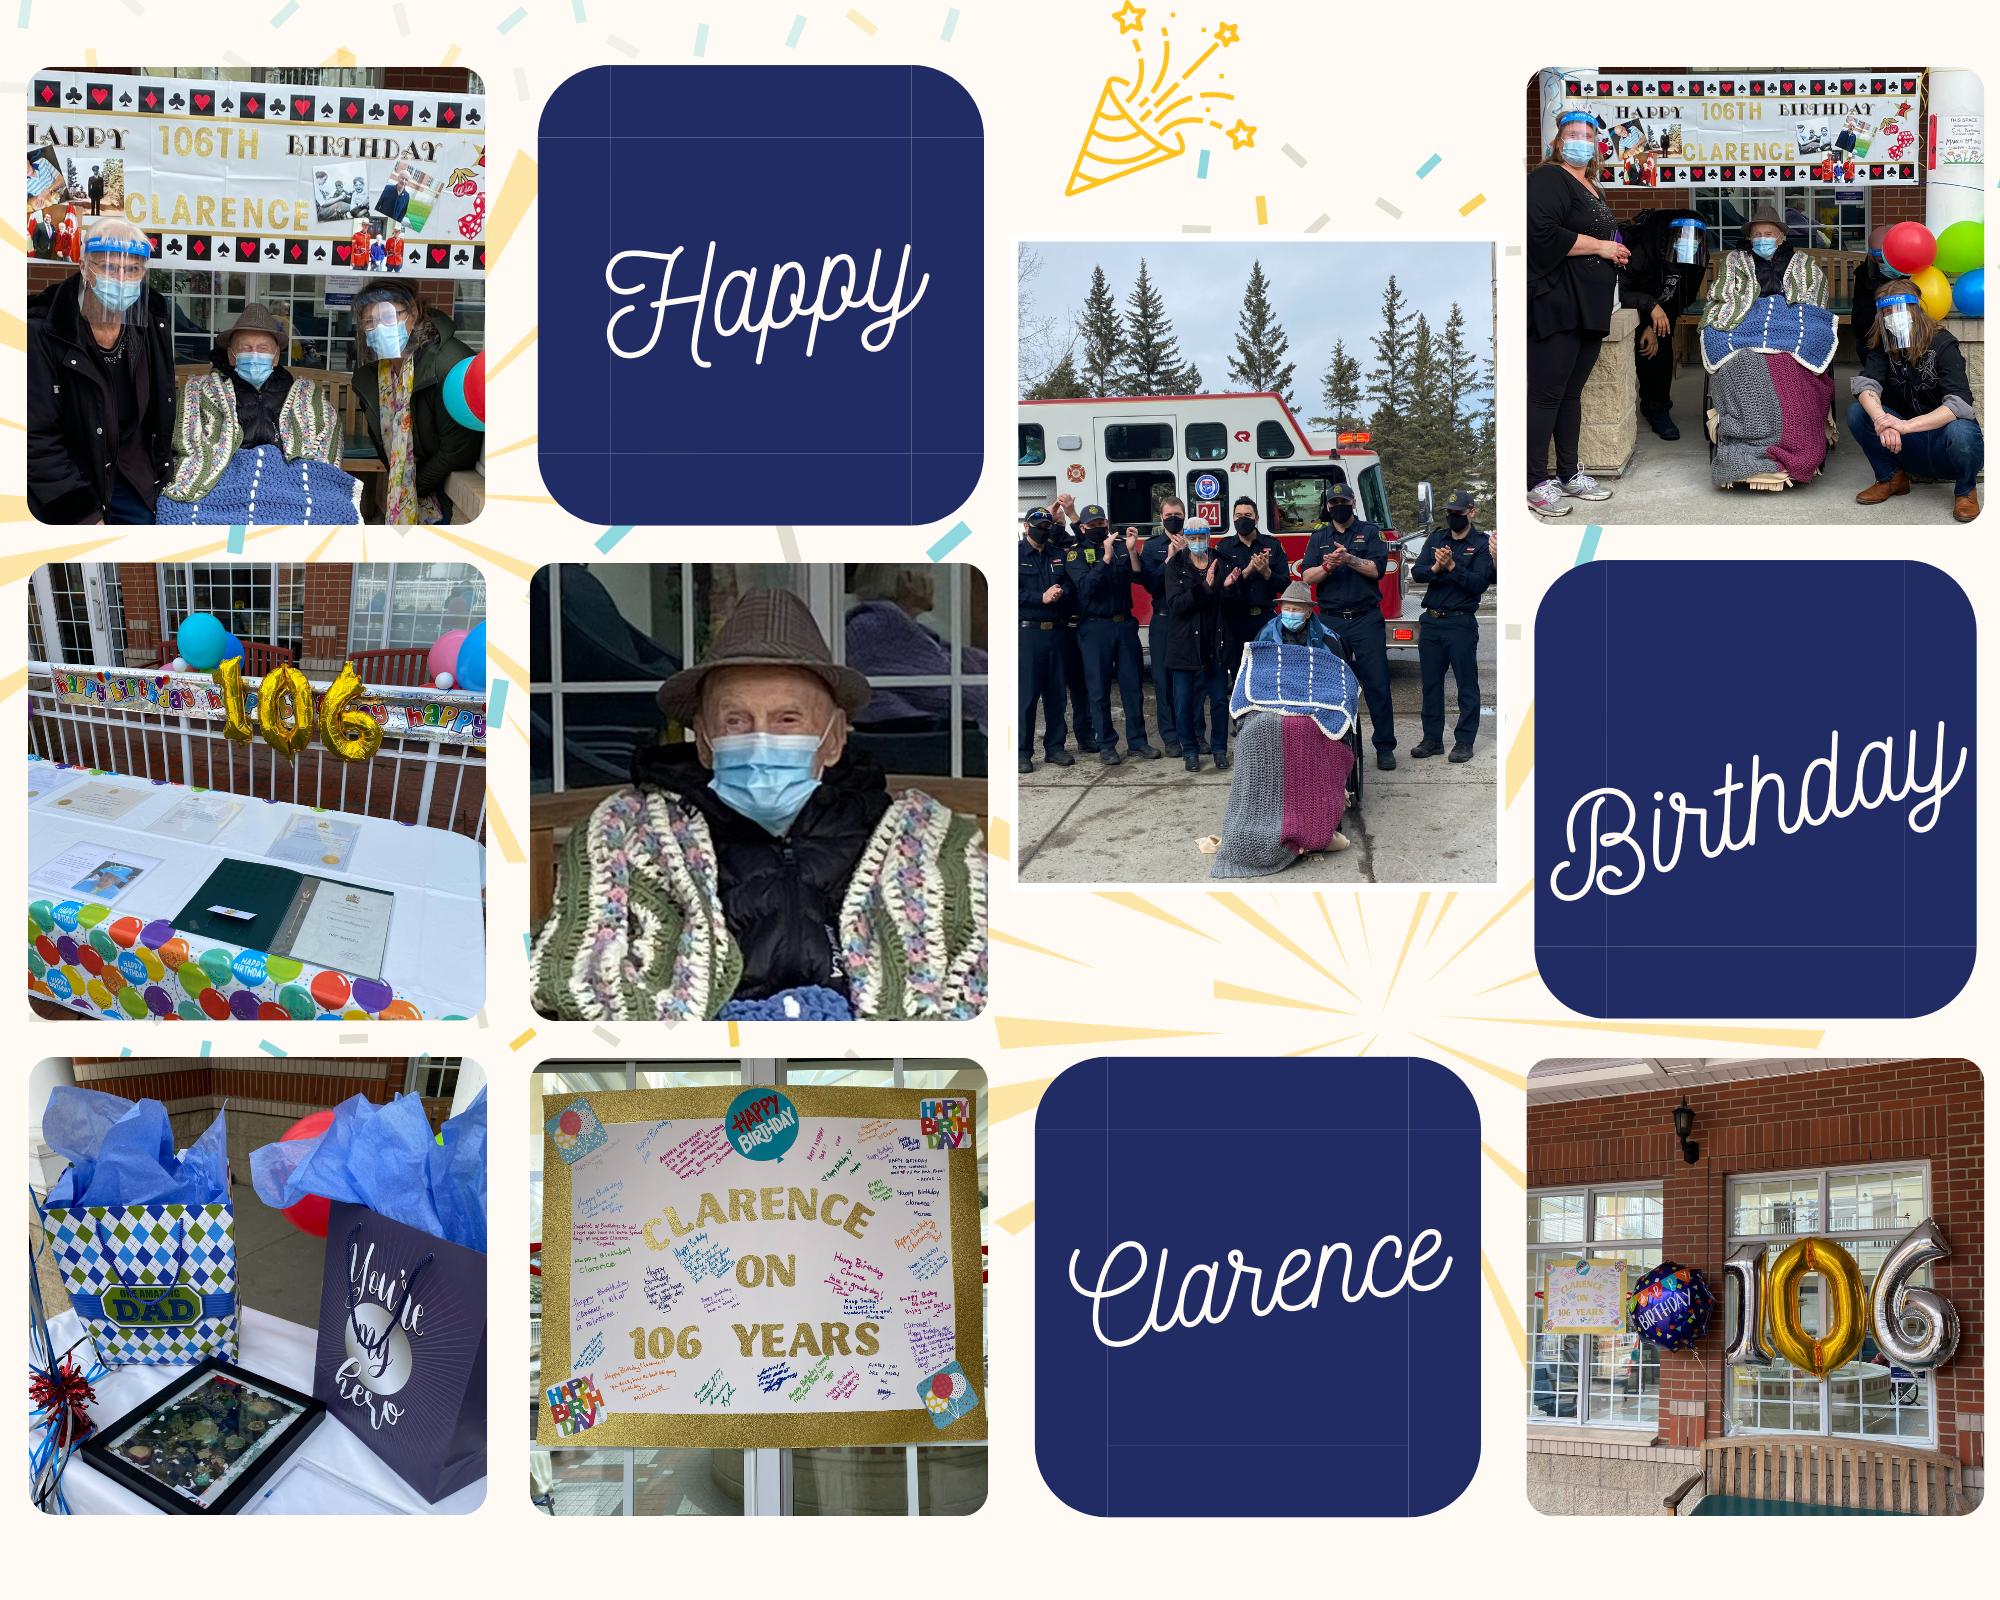 Clarence Birthday Celebration